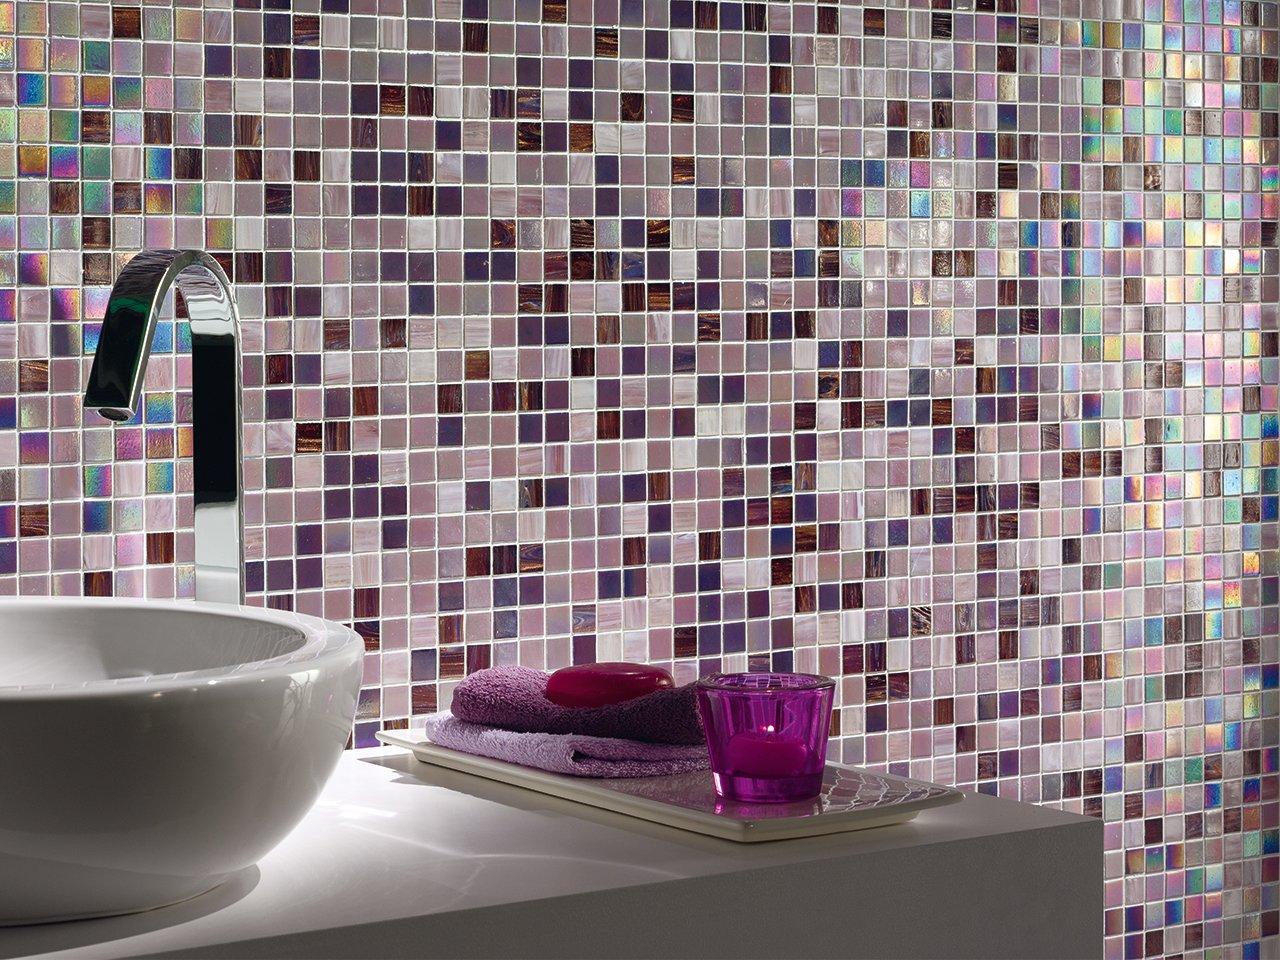 Mos vetro v3231 sweet purple iperceramica for Mosaico vetro bagno